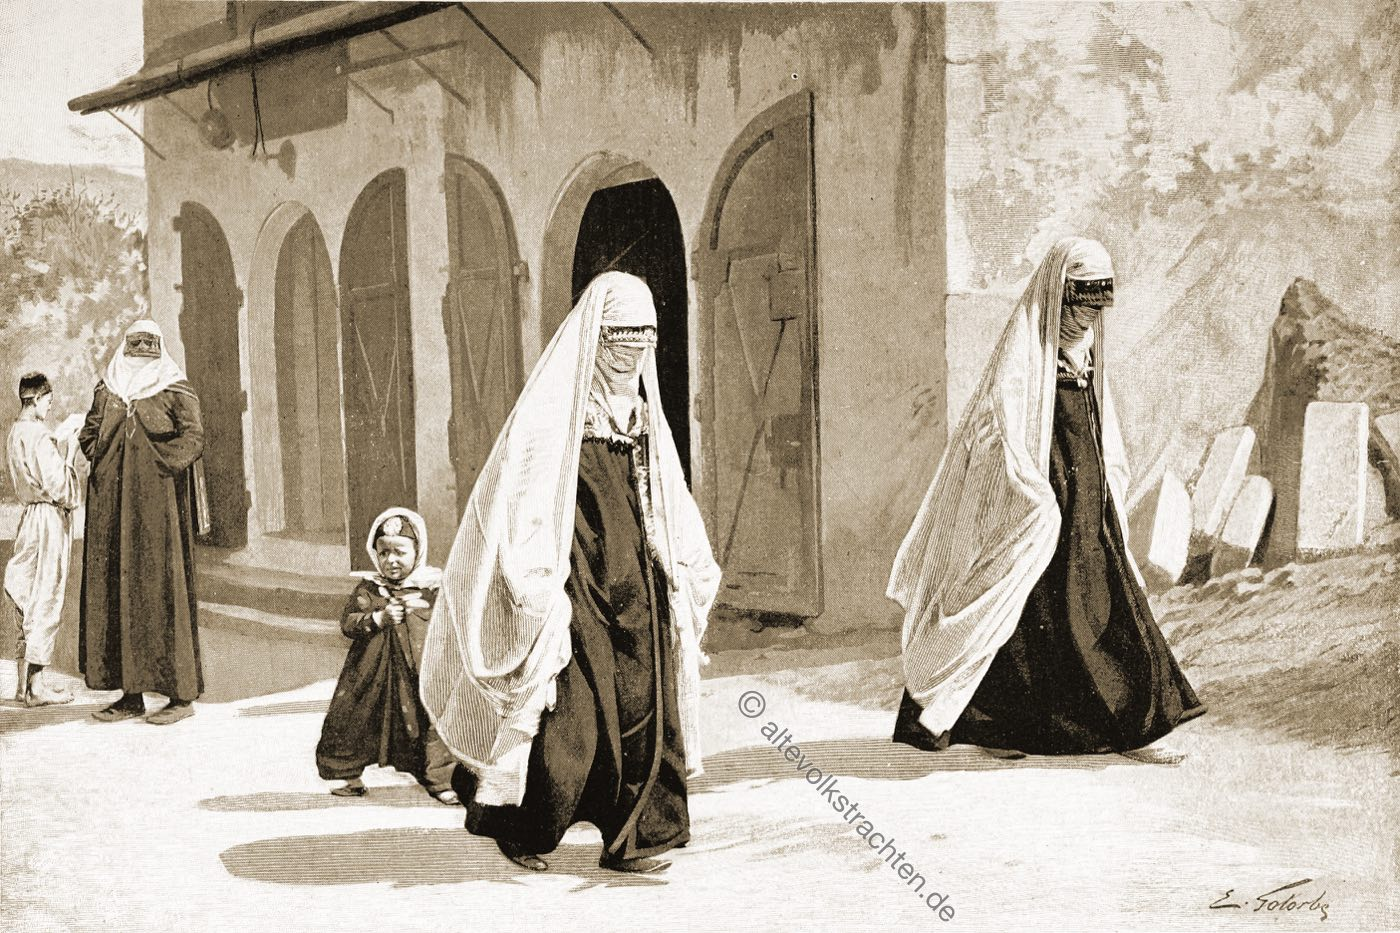 Muslimische Frauen, Trachten, Bosnien, Herzegowina, Guillaume Capus, Reiseliteratur, Balkan